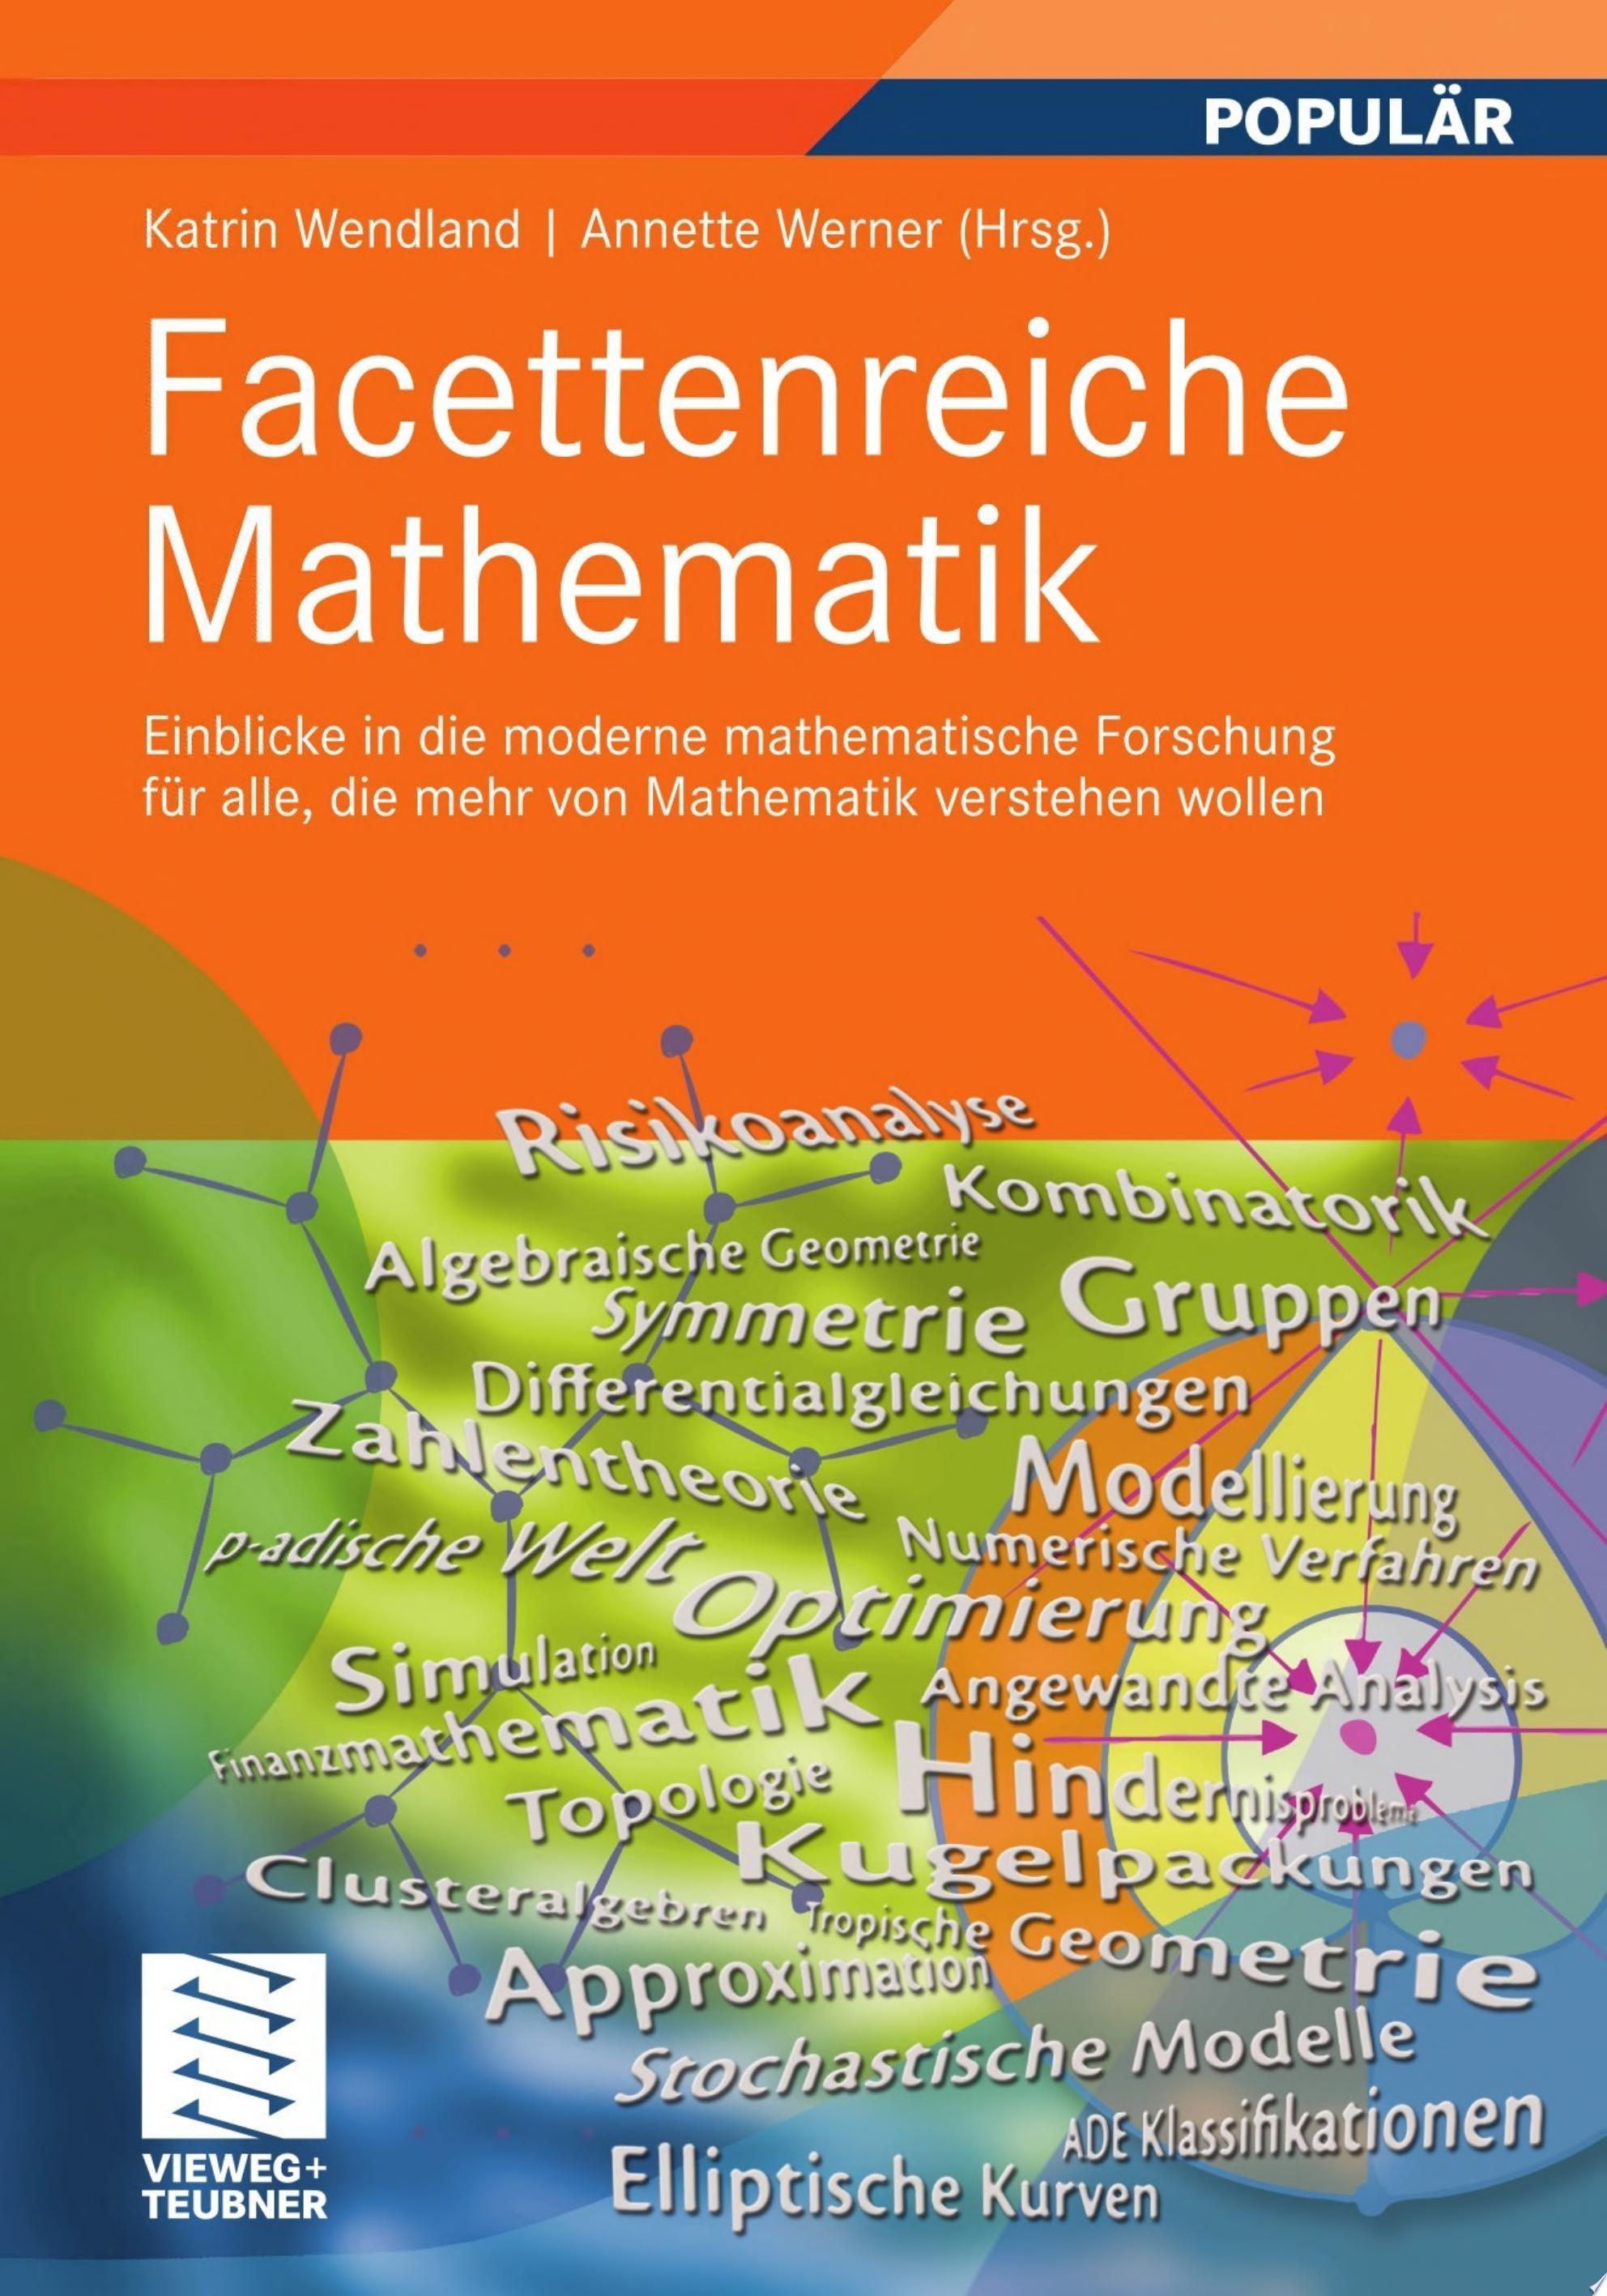 Facettenreiche Mathematik